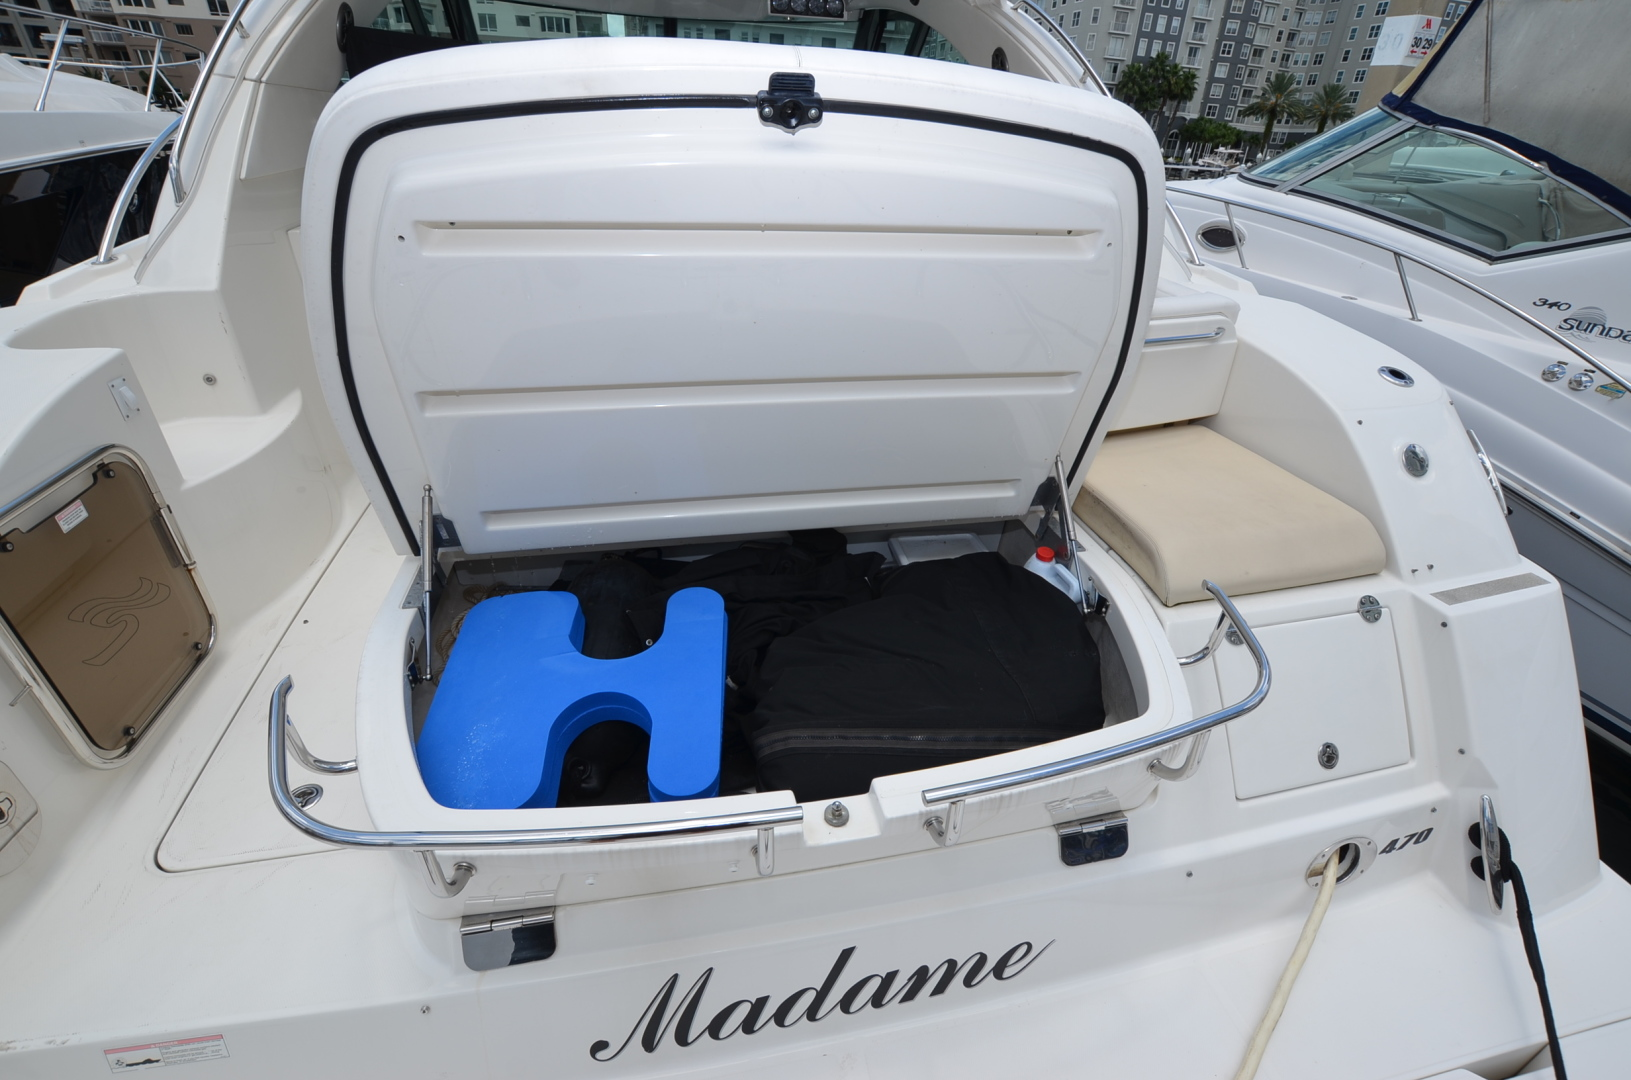 Sea Ray-470 Sundancer 2014-Madam Tampa-Florida-United States-1455551 | Thumbnail